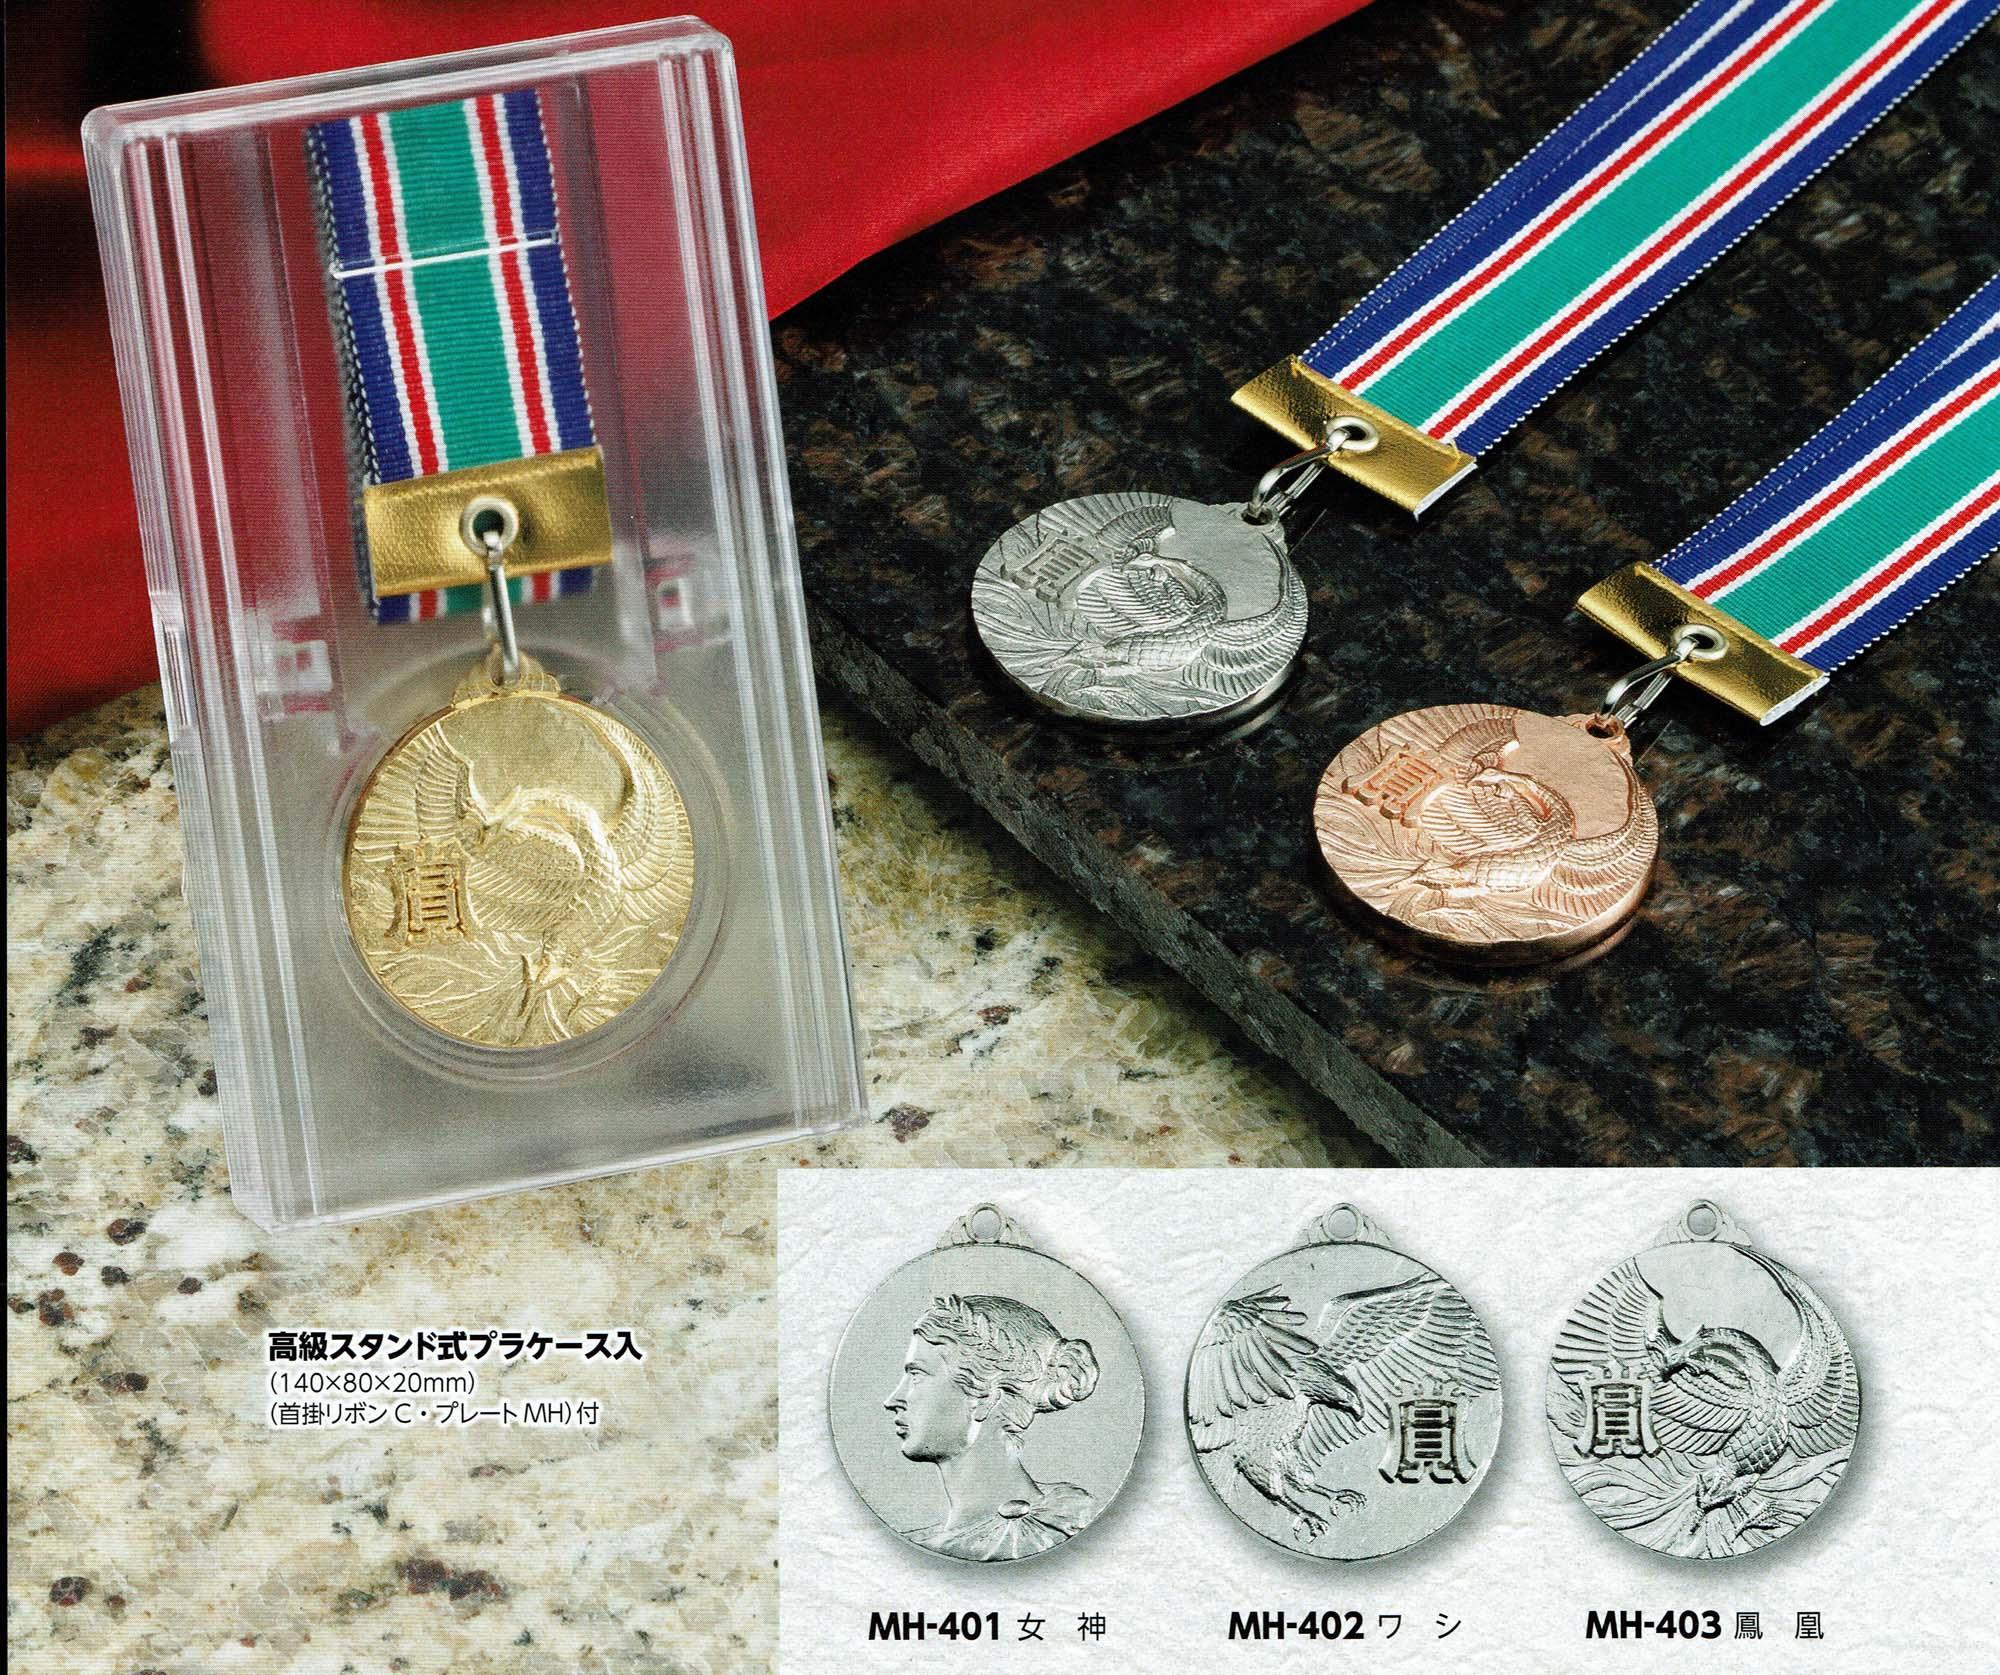 MHメダル 高級スタンドケース入